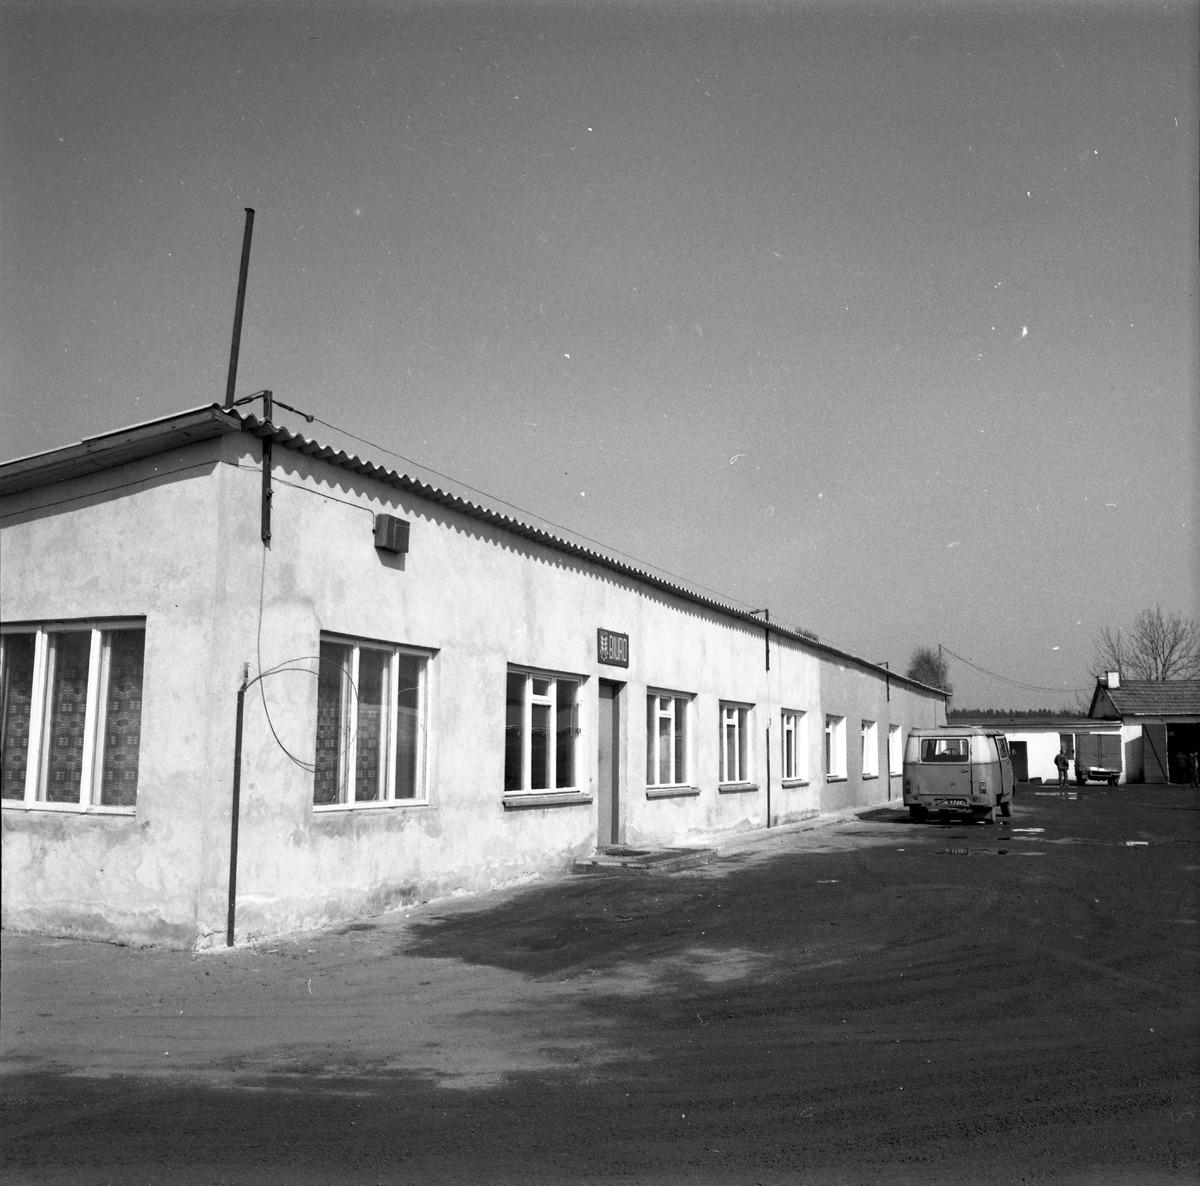 Biuro bazy transportowej [2]